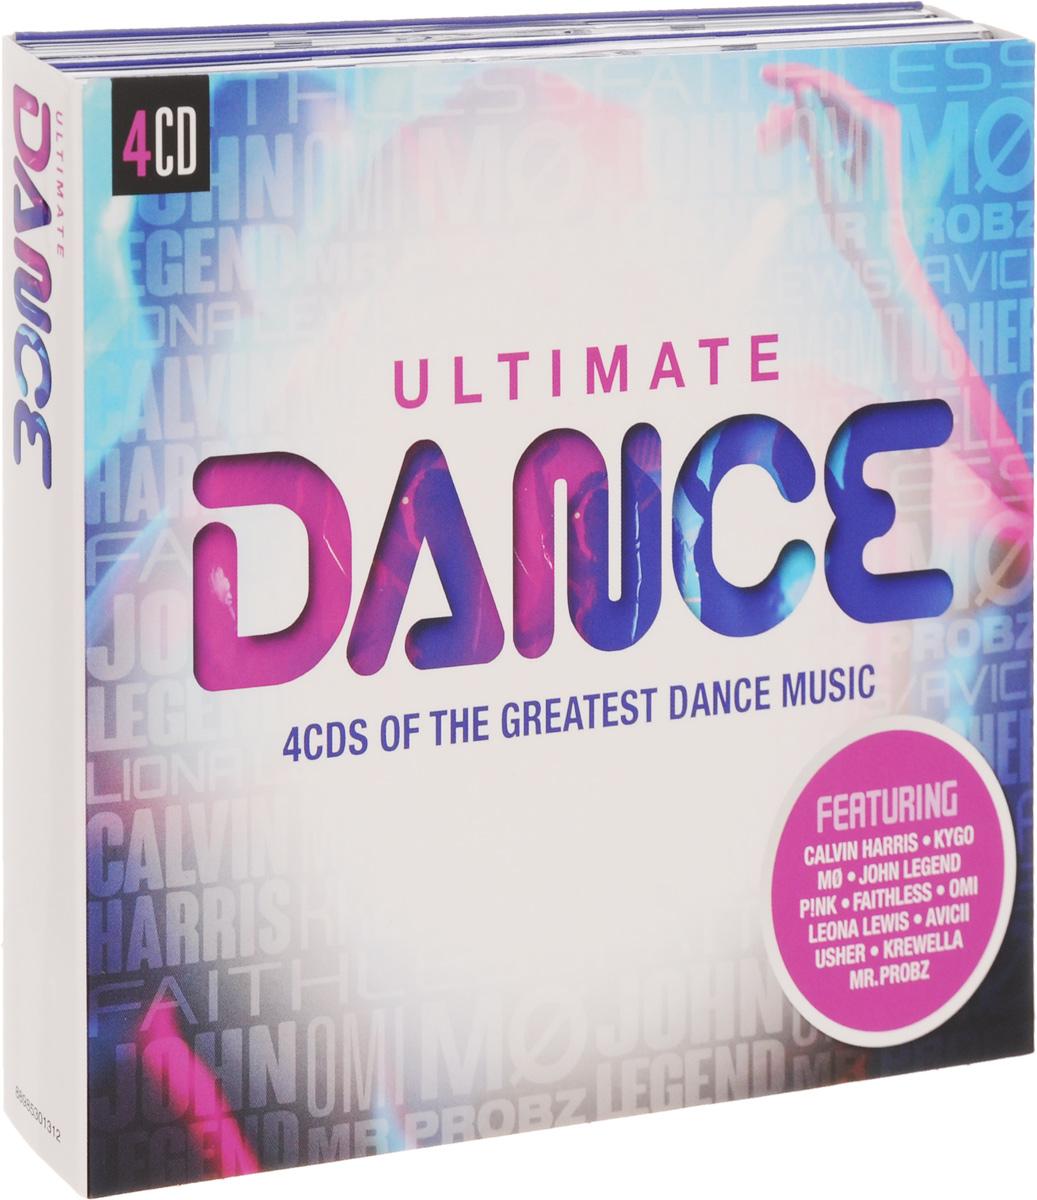 Ultimate Dance (4 CD) warner bros pictures inc vertigo entertainment media asia films ltd